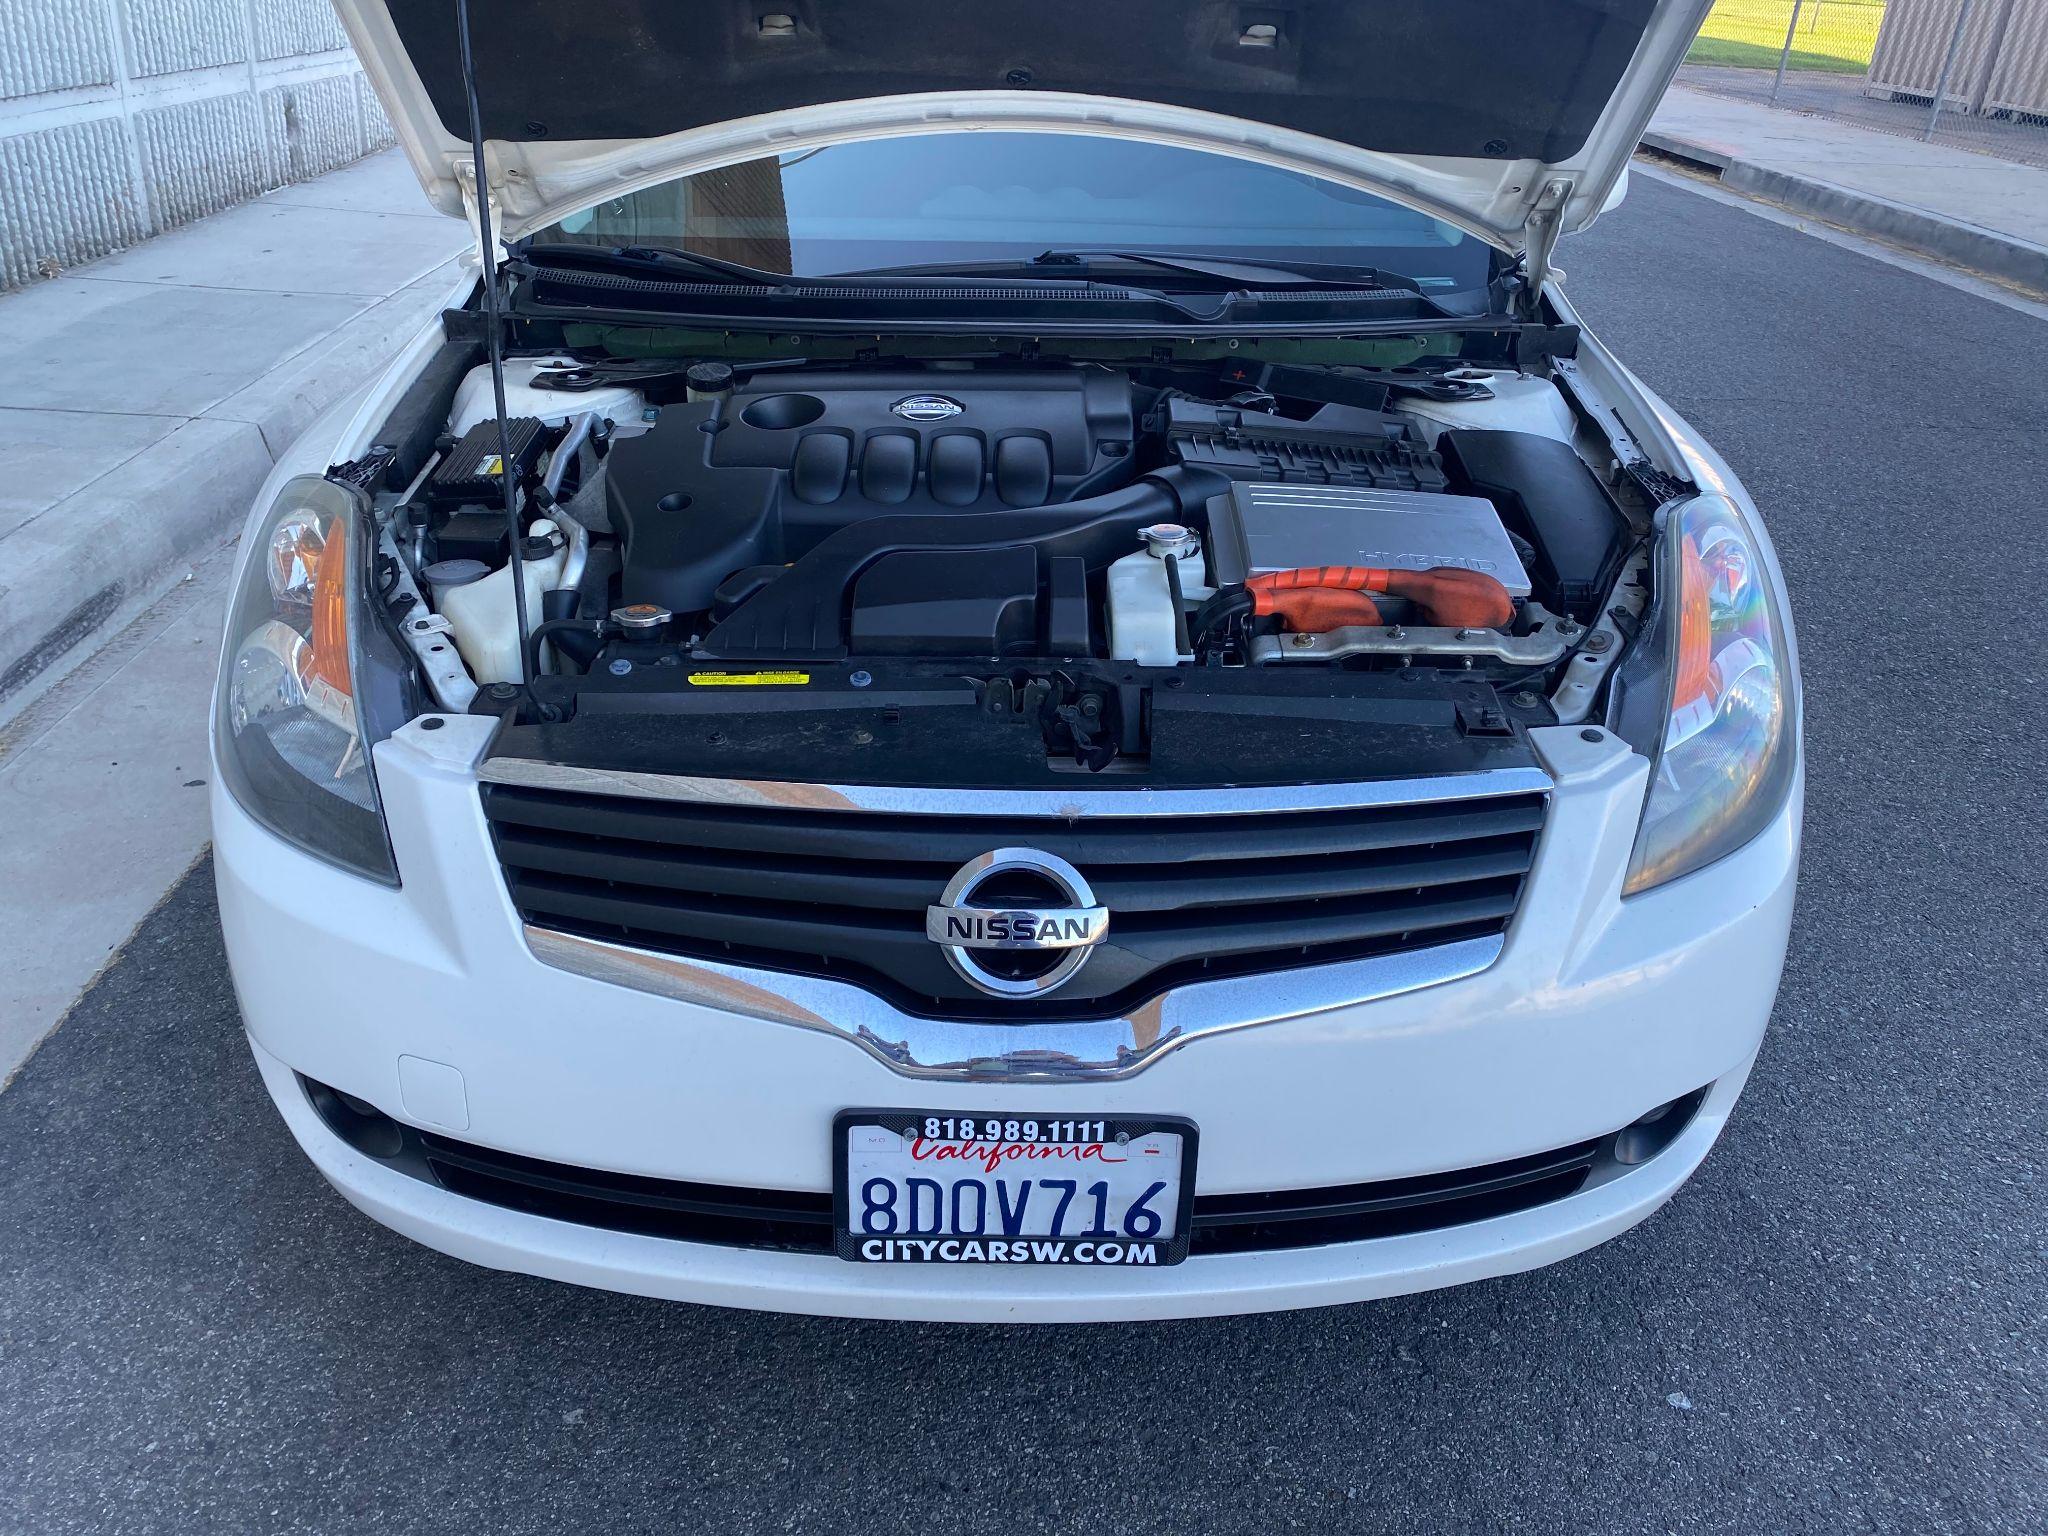 2007 Nissan Altima 2.5 Hybrid